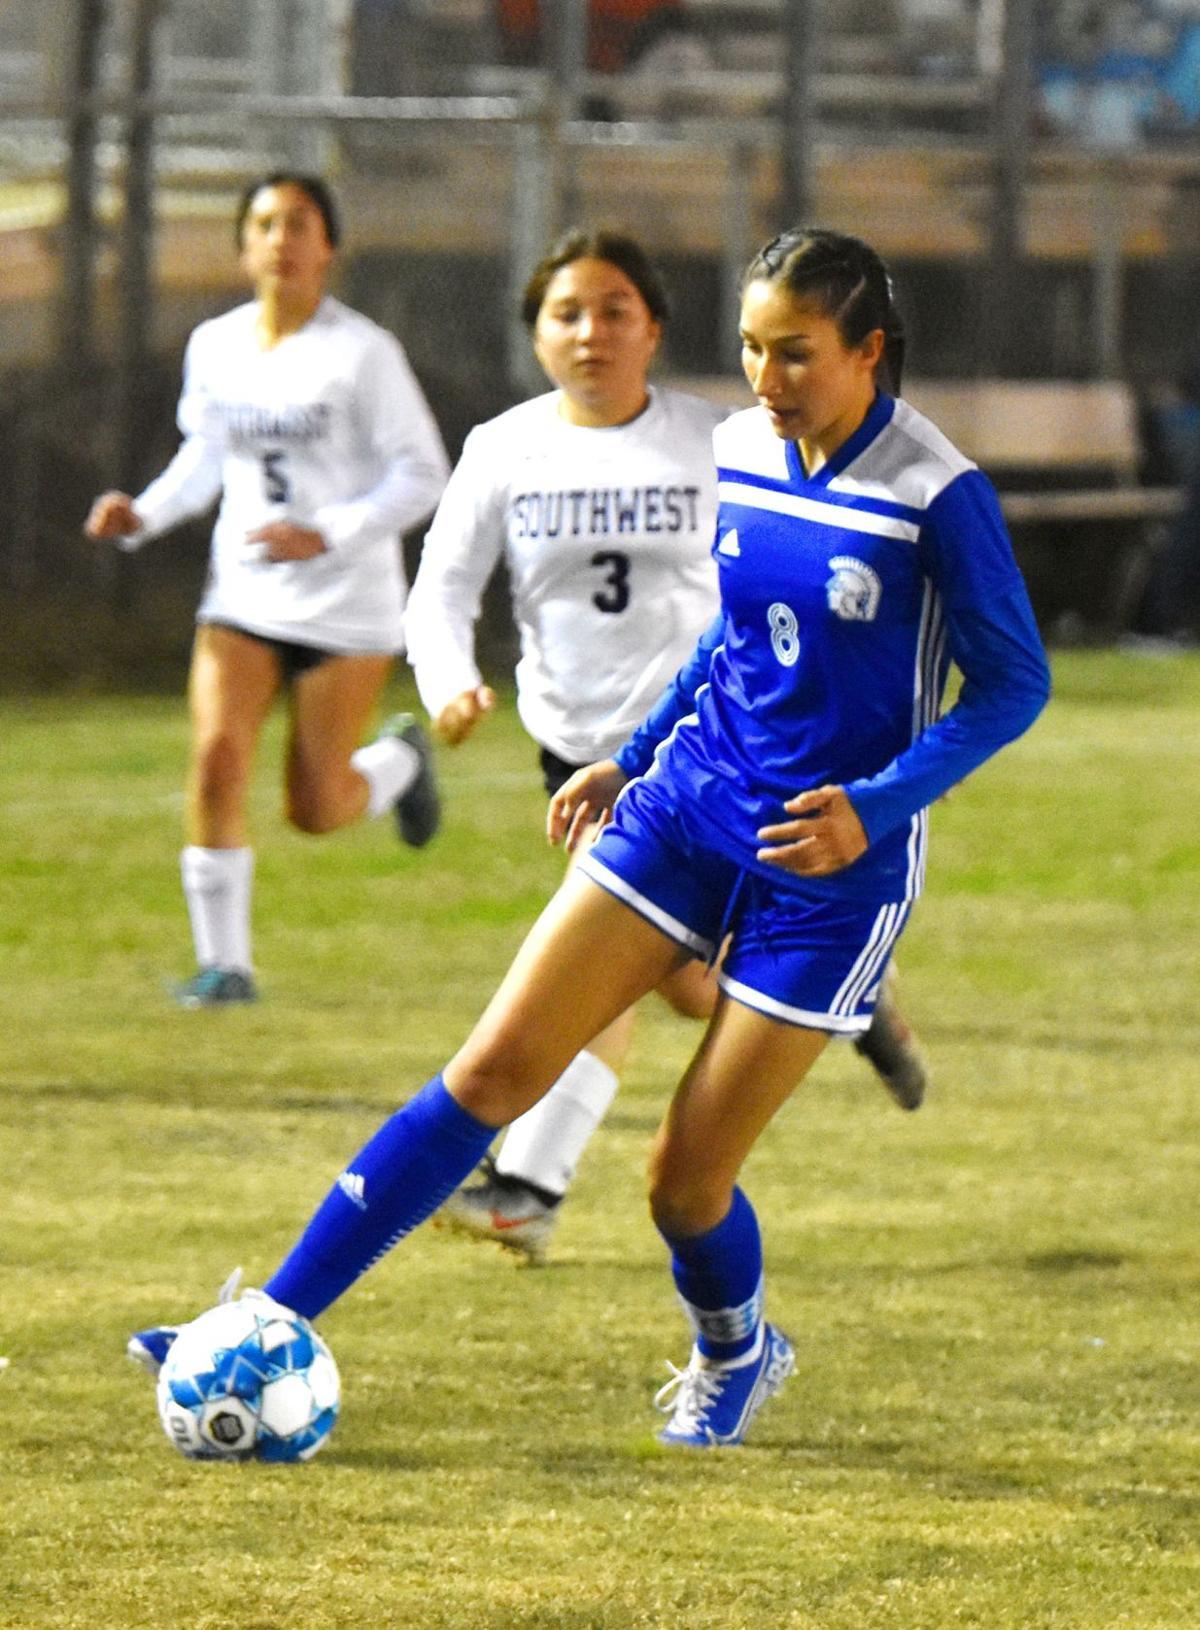 All-IVL soccer selections spotlight Valley's finest